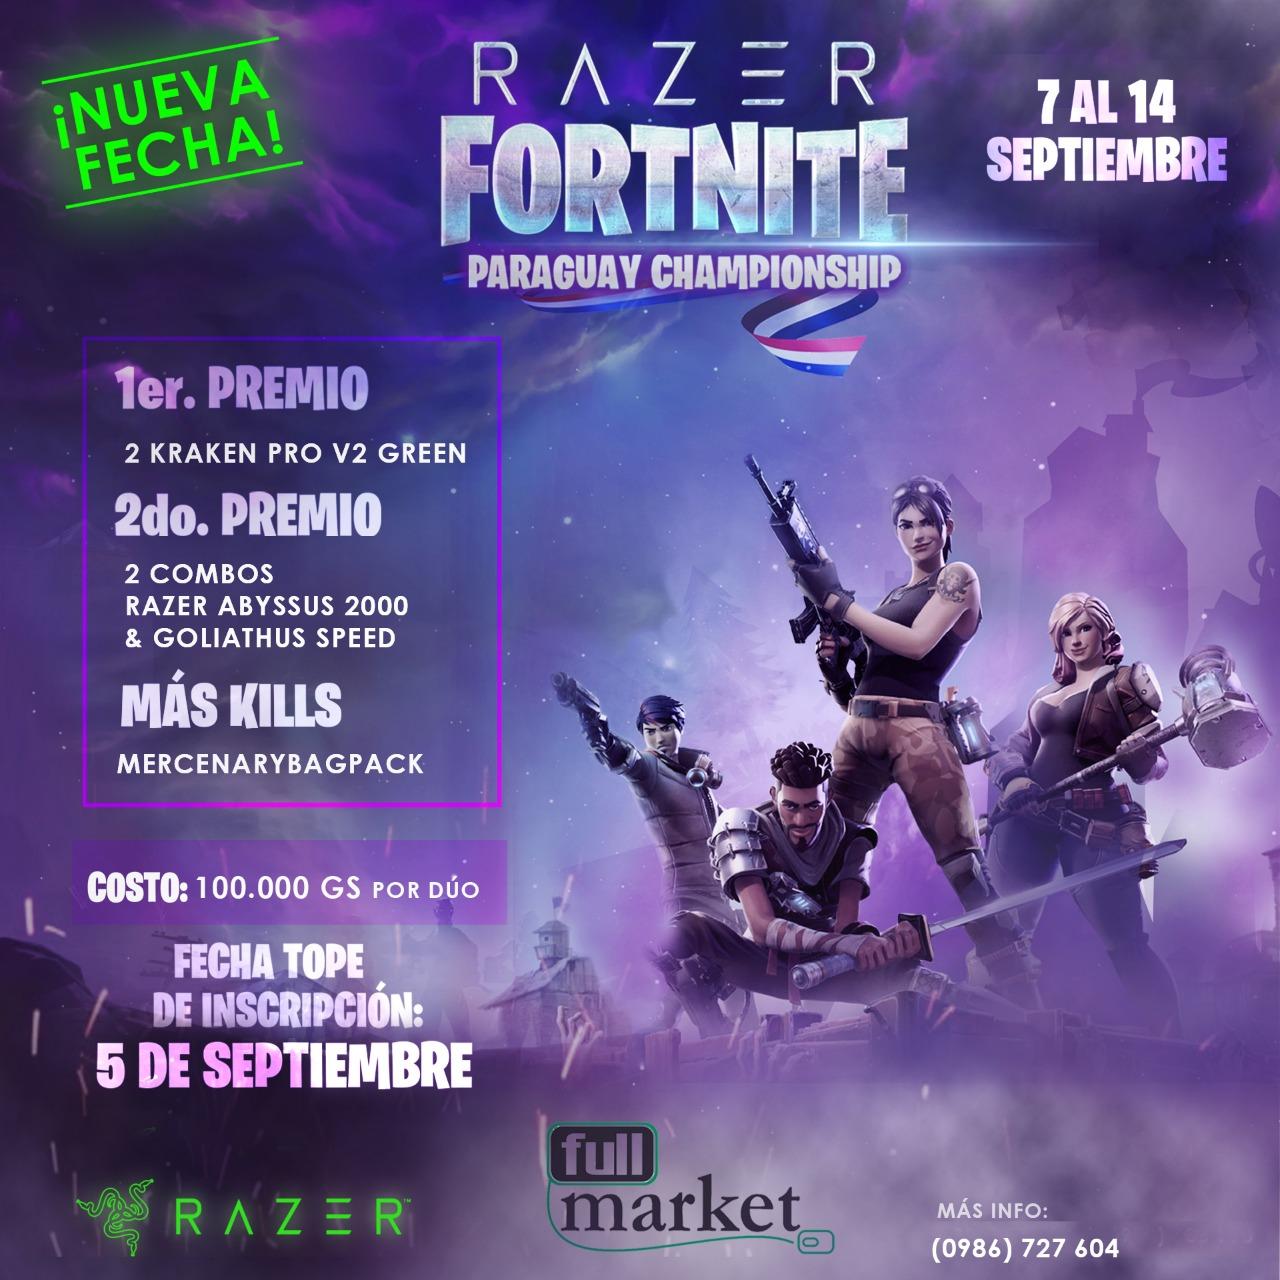 Fortnite Paraguay Championship del 7 al 14 de septiembre 2018